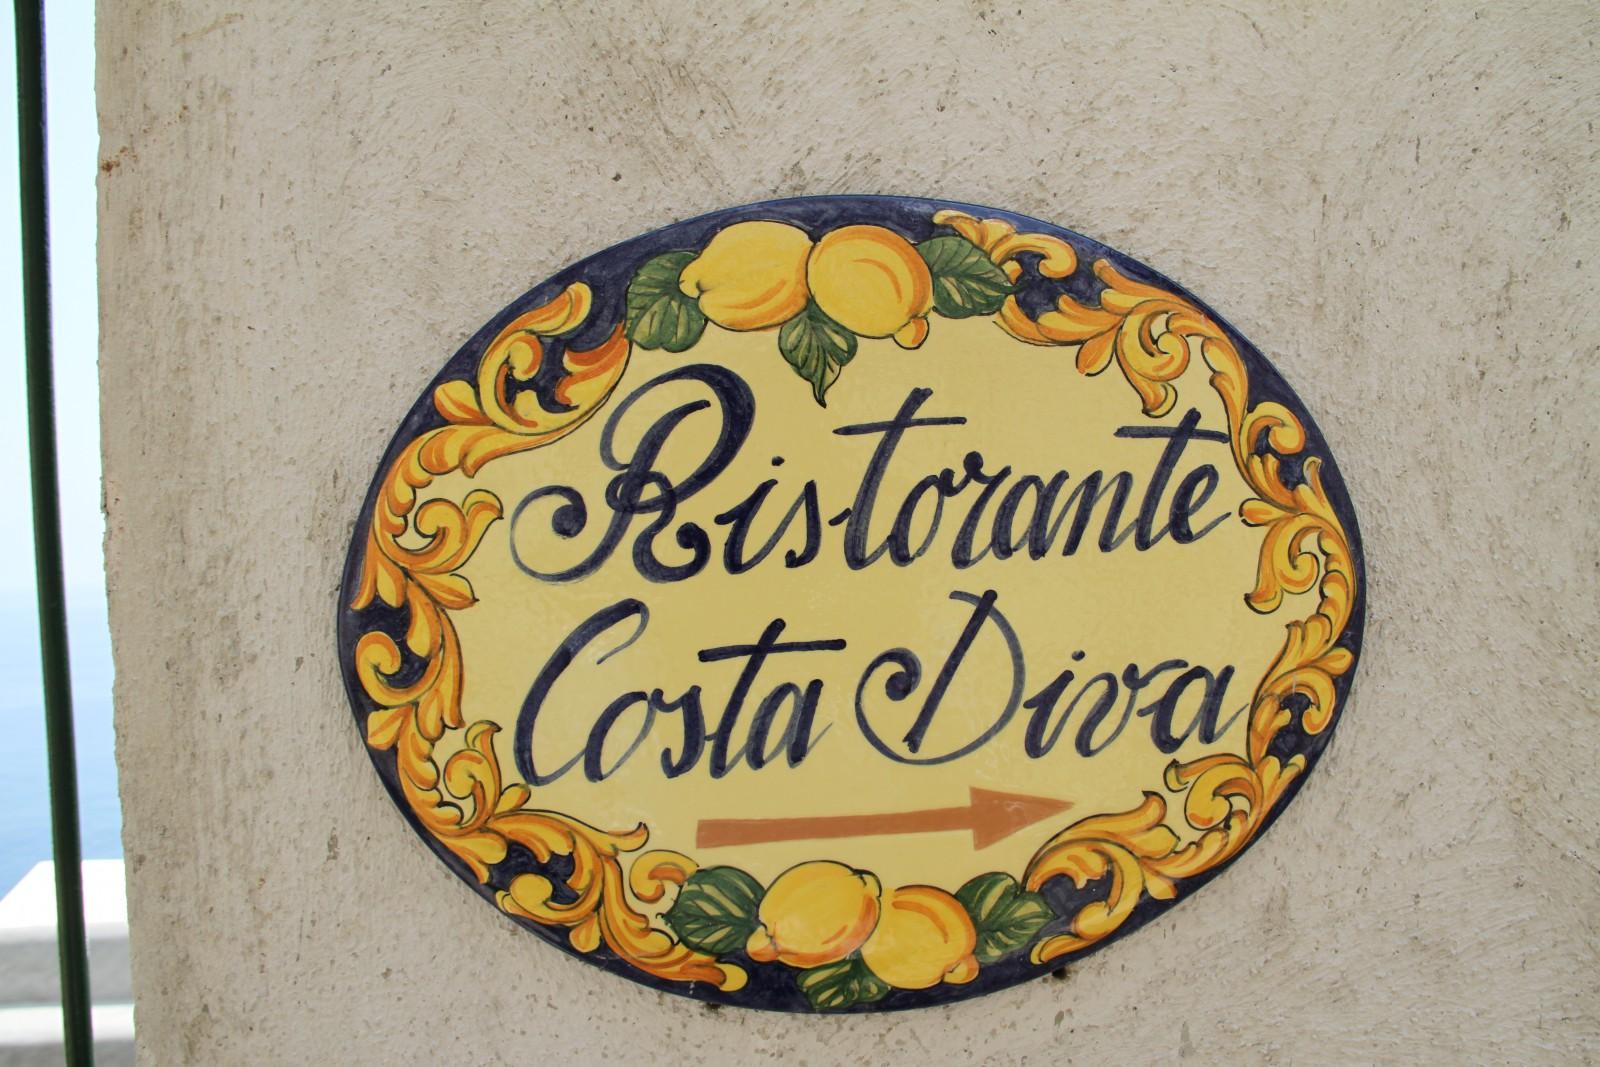 cover-Locanda Costa Diva